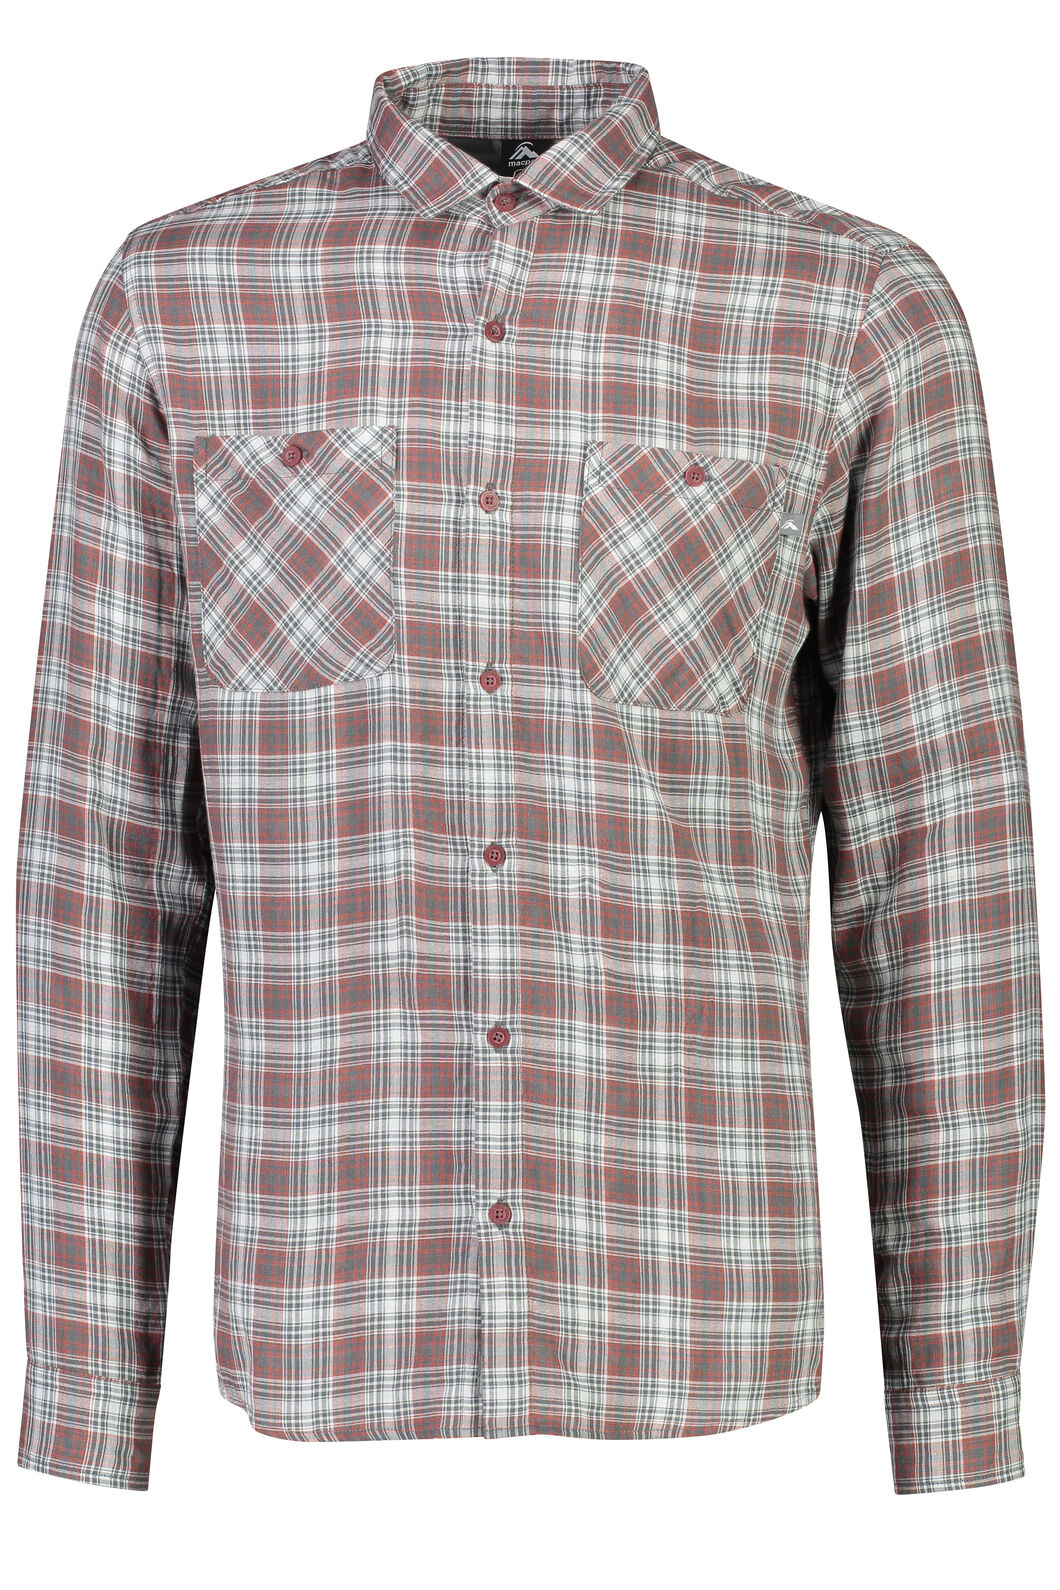 Olivine Shirt - Men's, Ketchup, hi-res